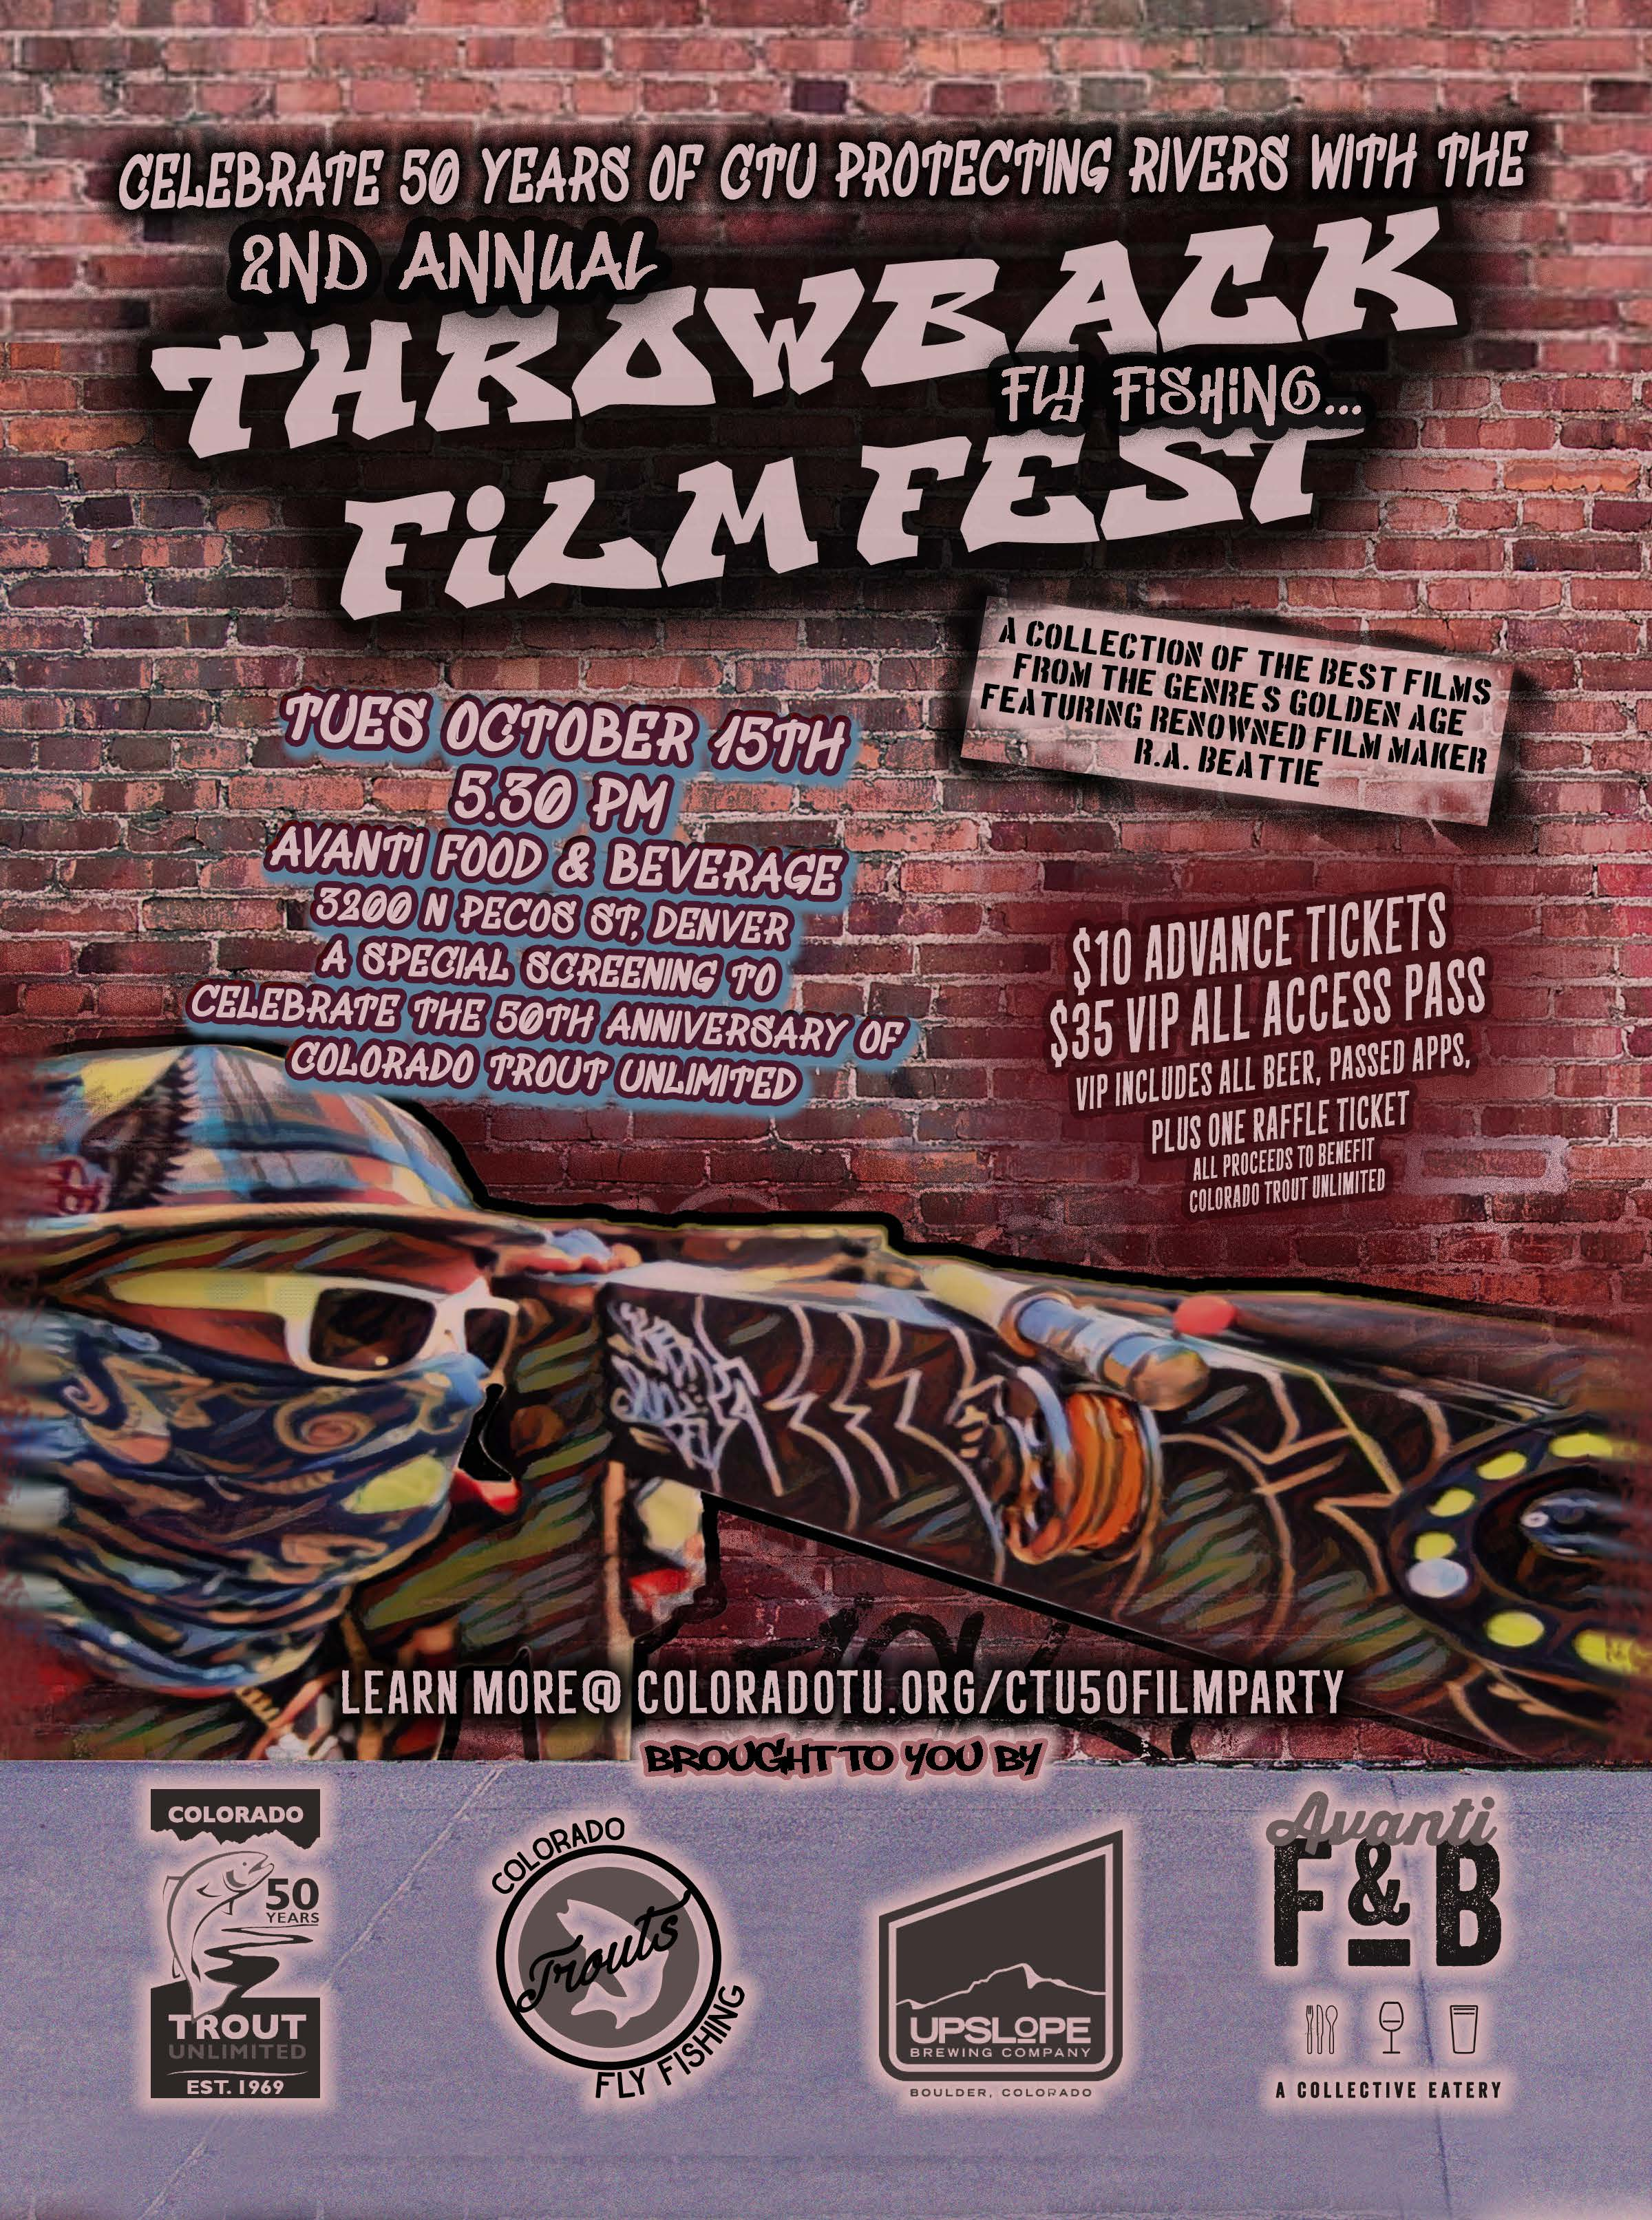 ThrowbackFilmFest2019.jpg